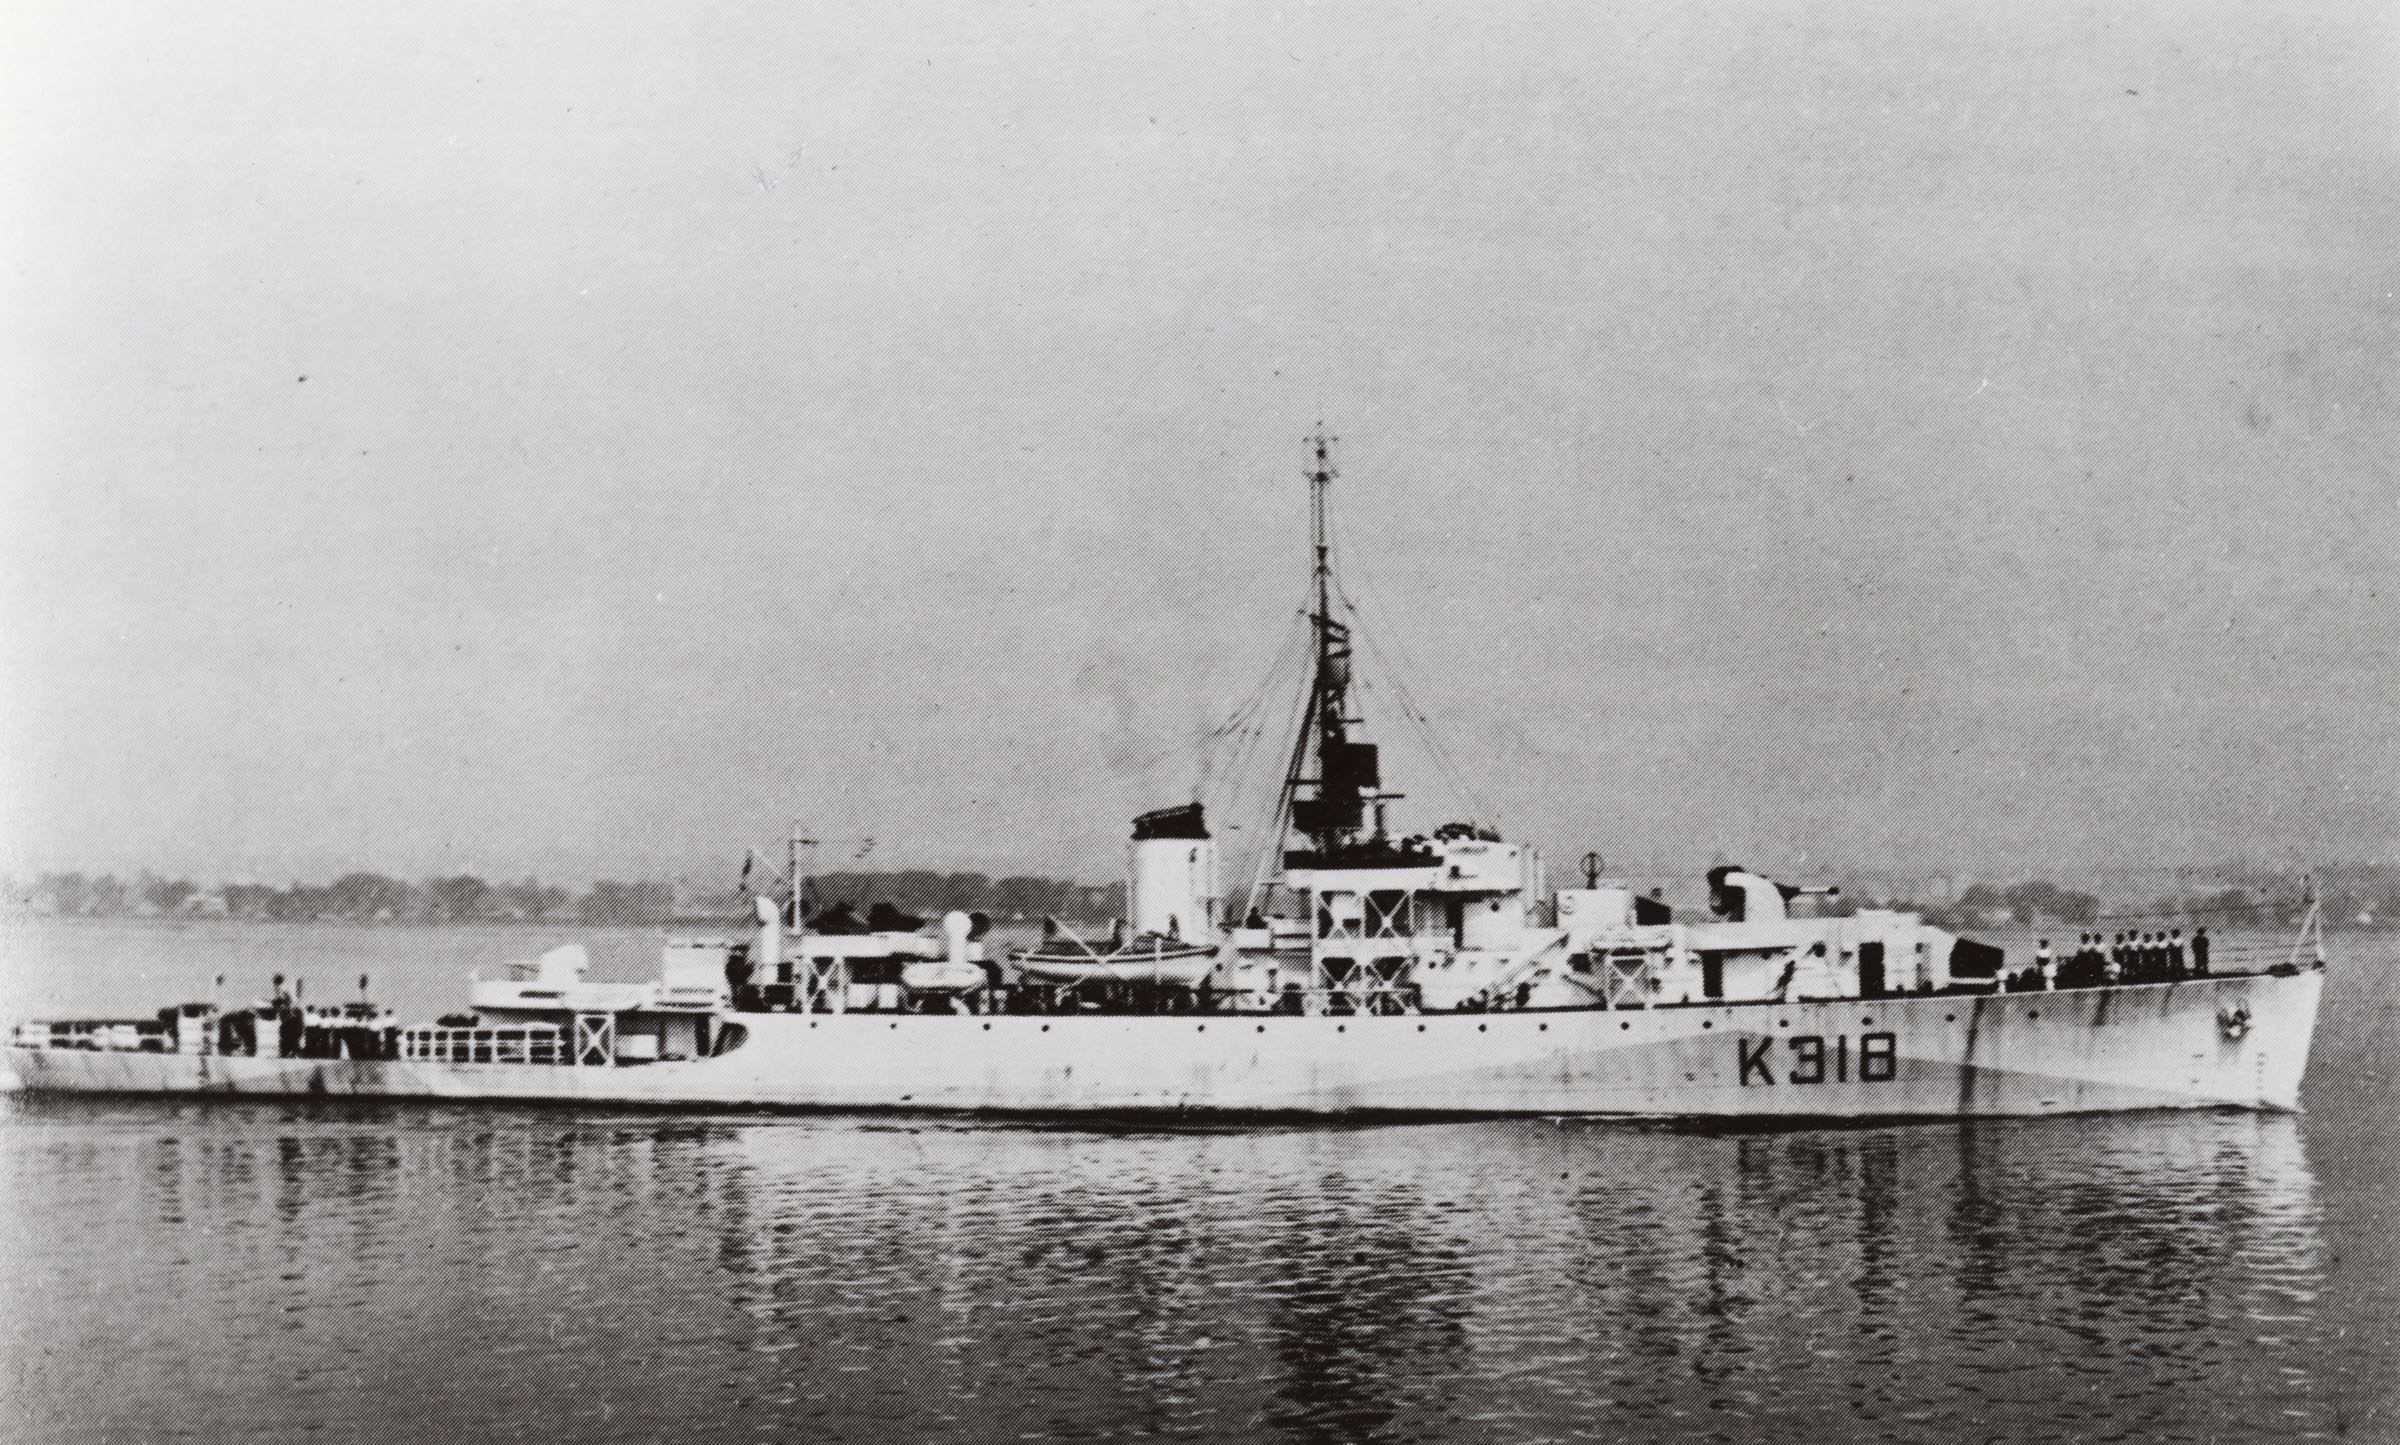 HMCS JONQUIERE